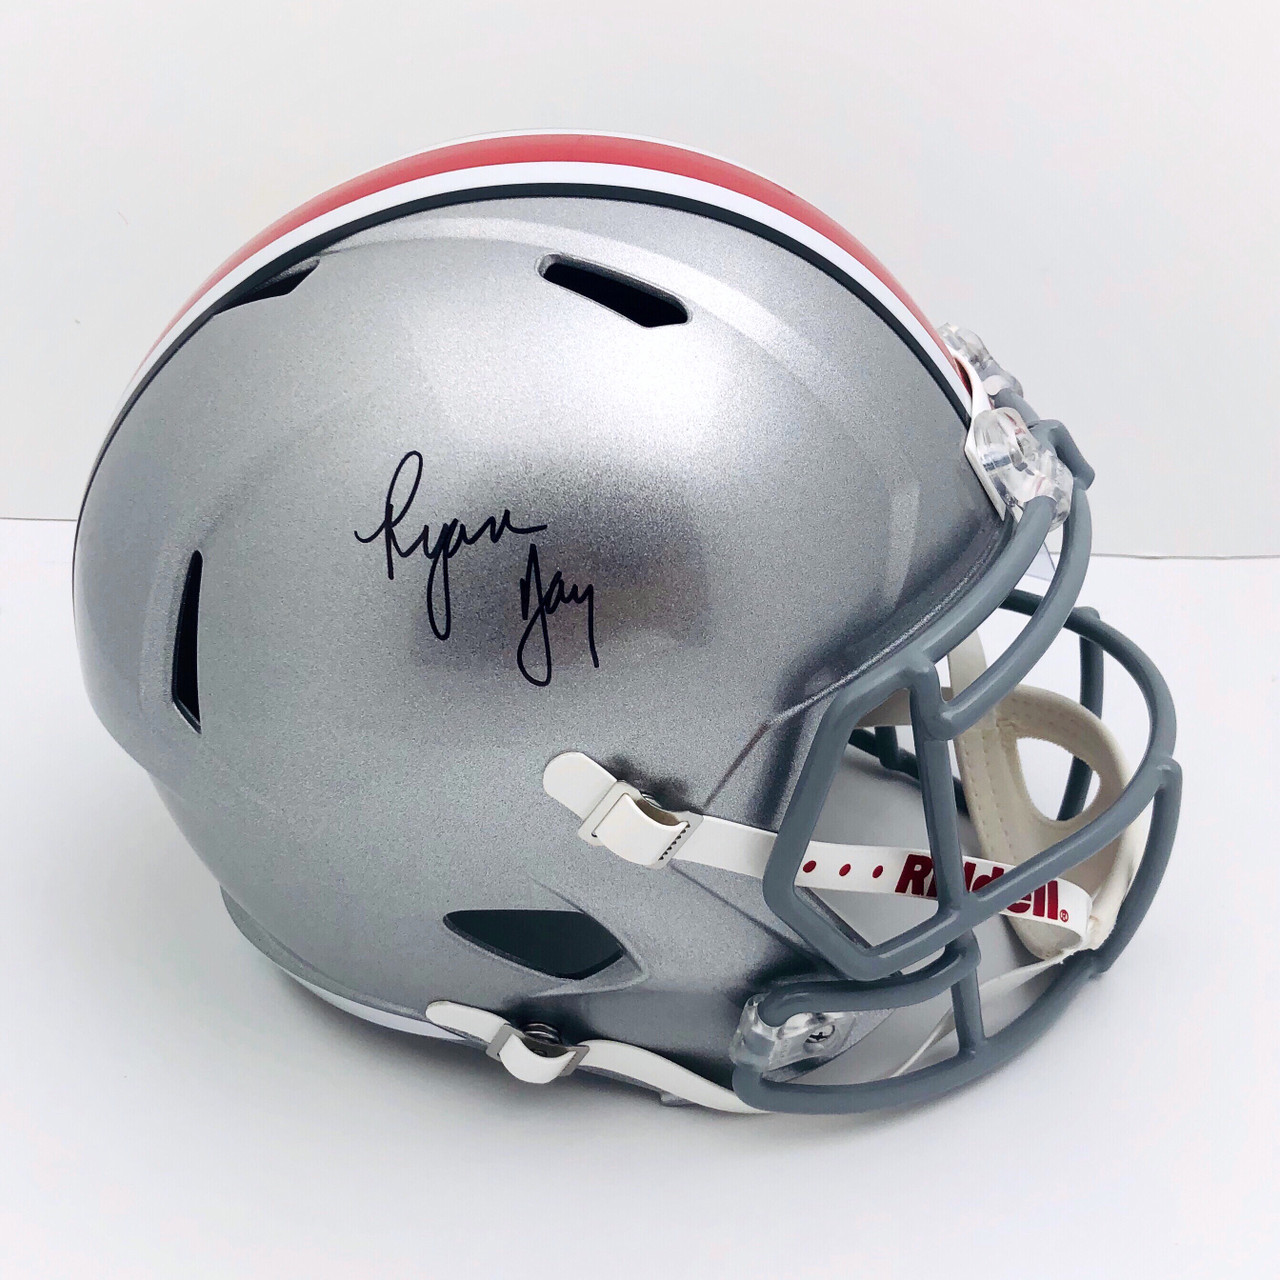 Ryan Day Ohio State Buckeyes Autographed Speed Replica Helmet - Certified Authentic